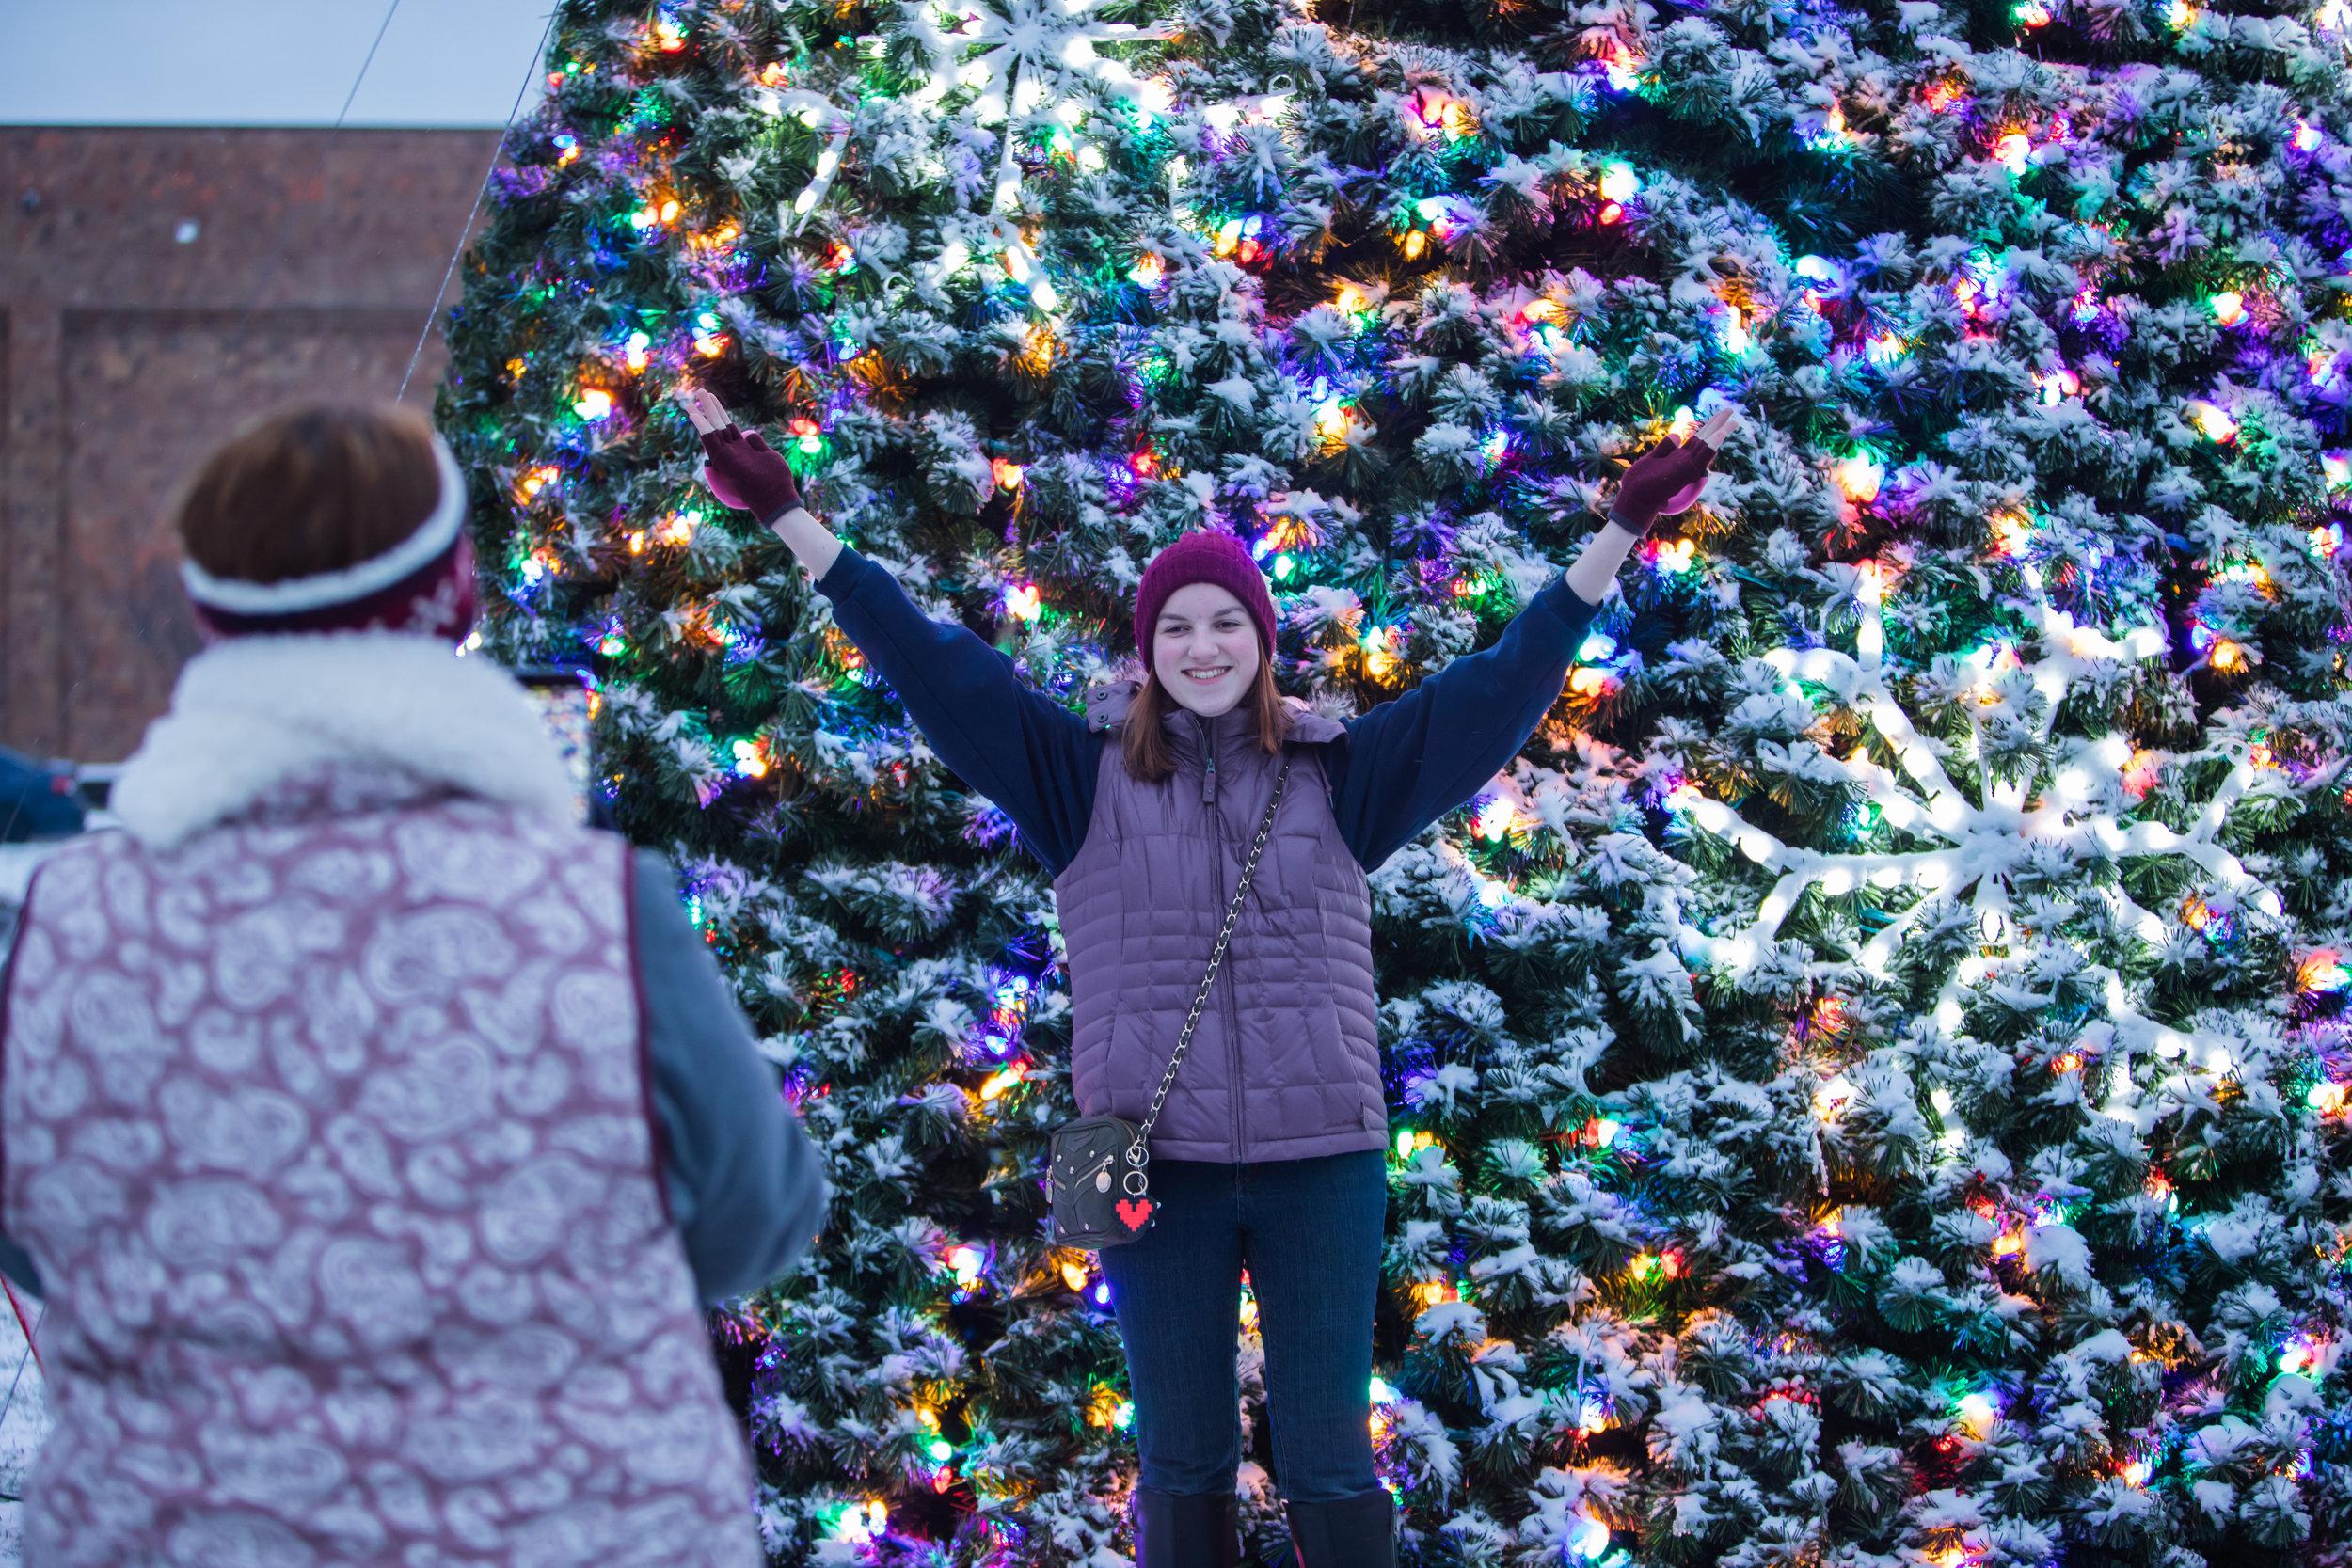 DWNTWN_Christmas Tree Shoot-53.jpg